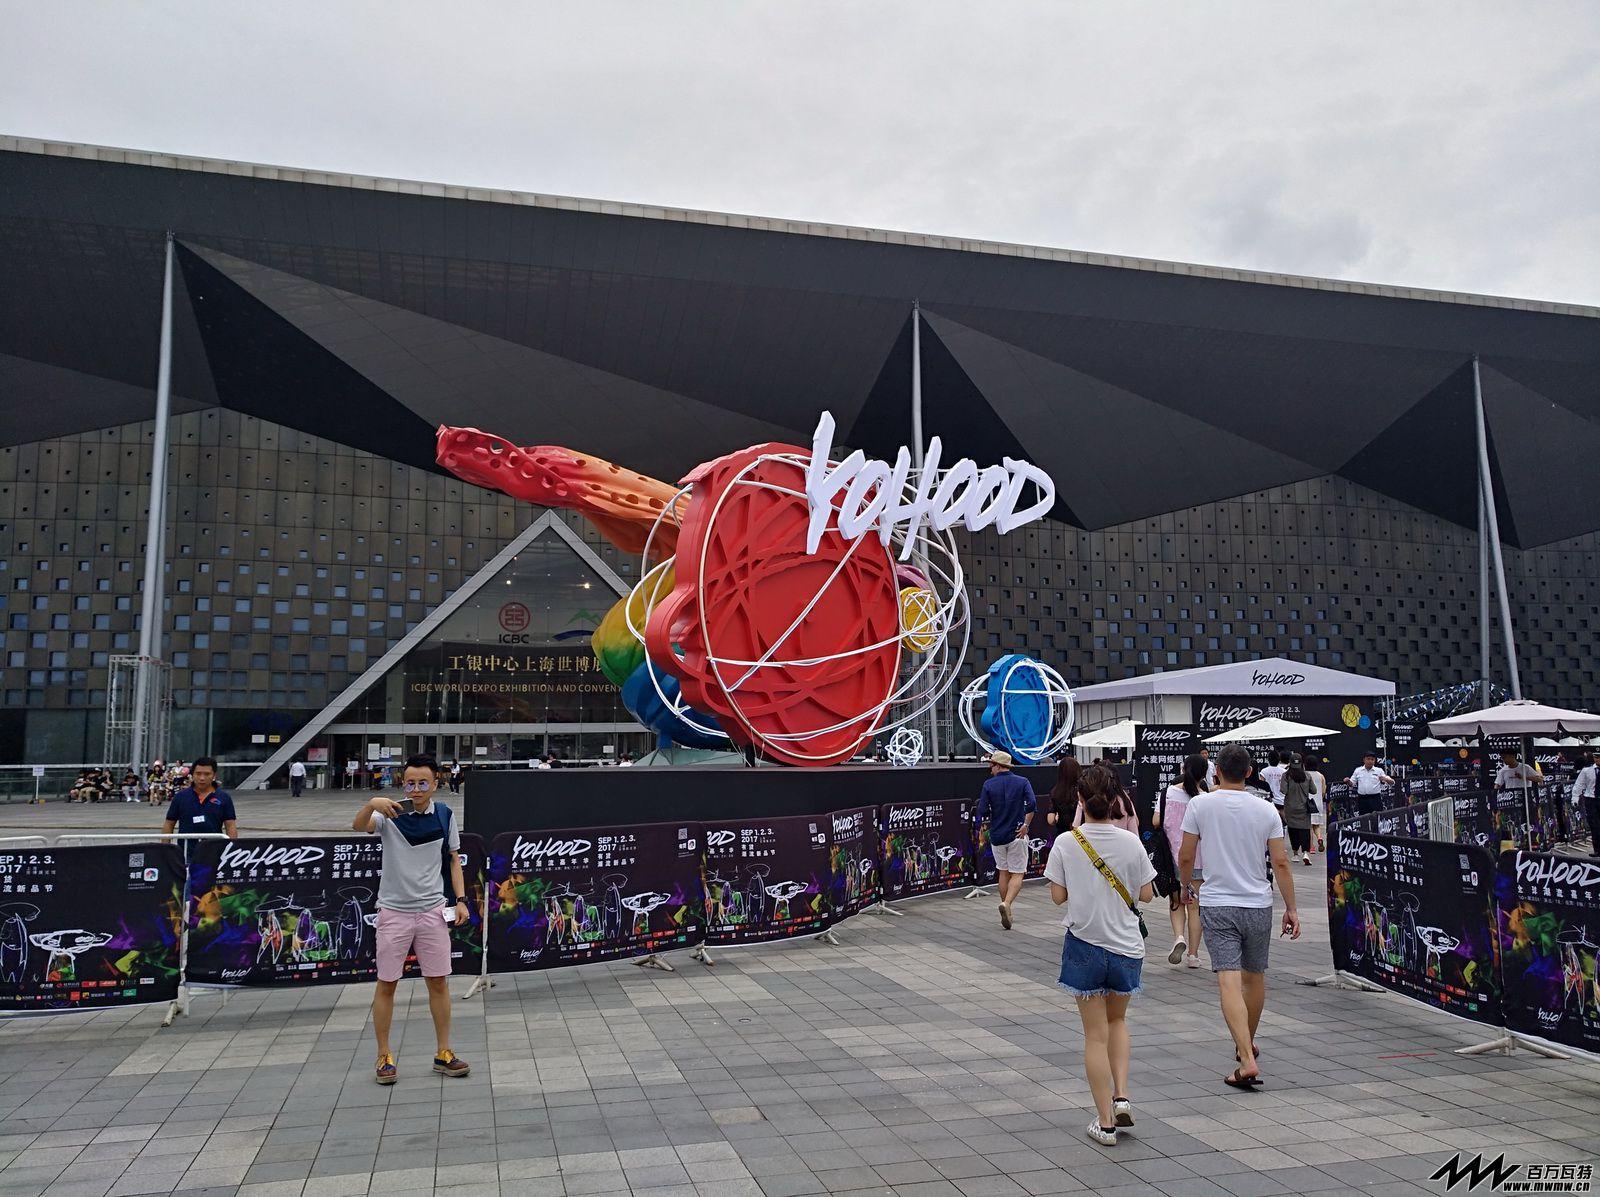 YOHOOD全球潮流嘉年华暨有货潮流新品节 (3).jpg